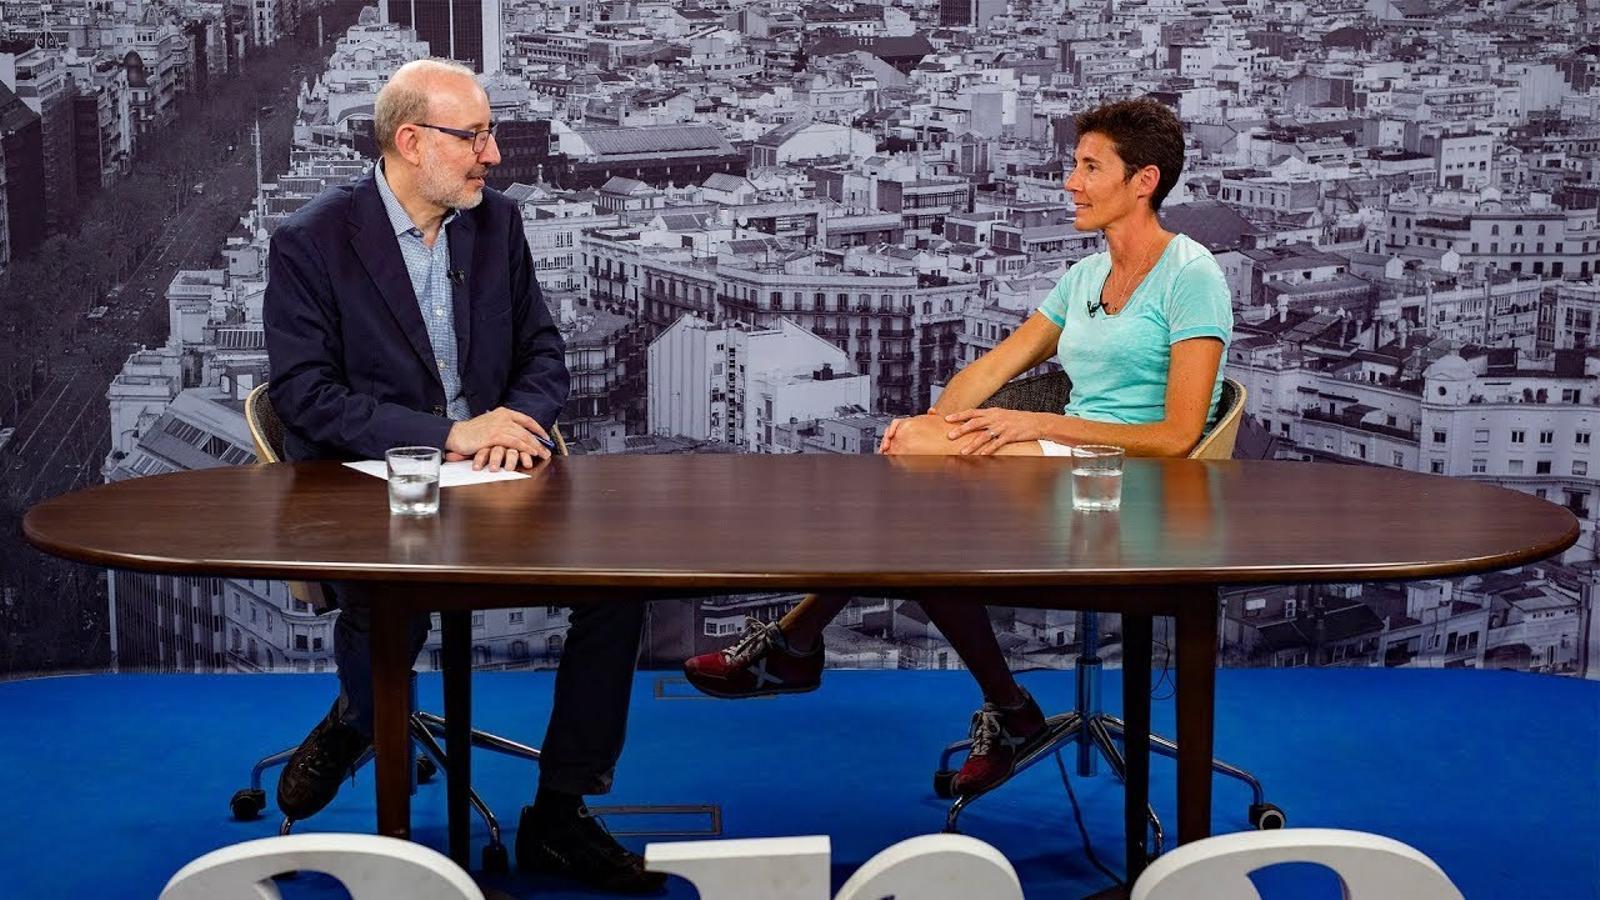 Entrevista d'Antoni Bassas a Silvia Tremoleda